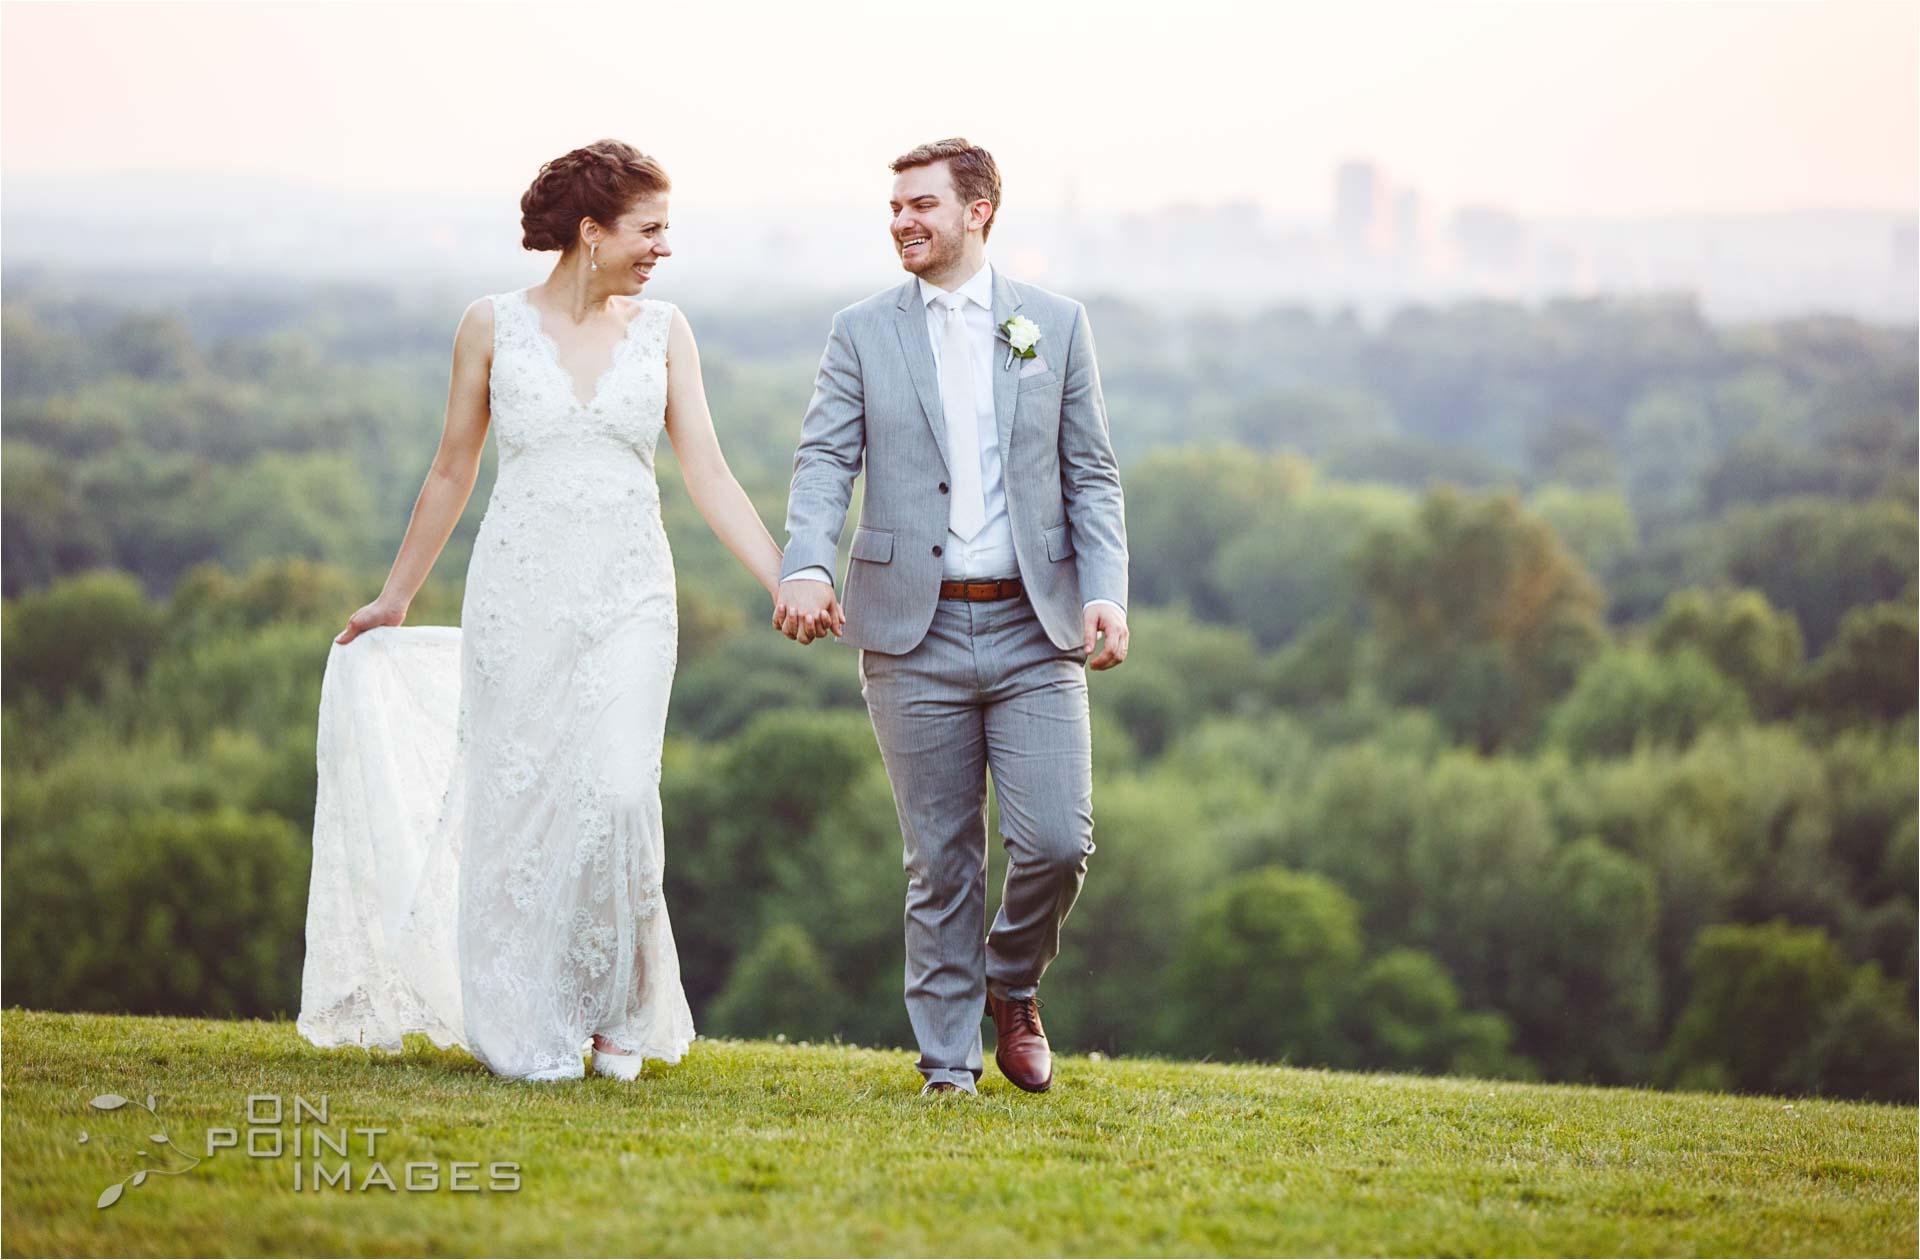 wickham-park-wedding-photographer-ct-35.jpg